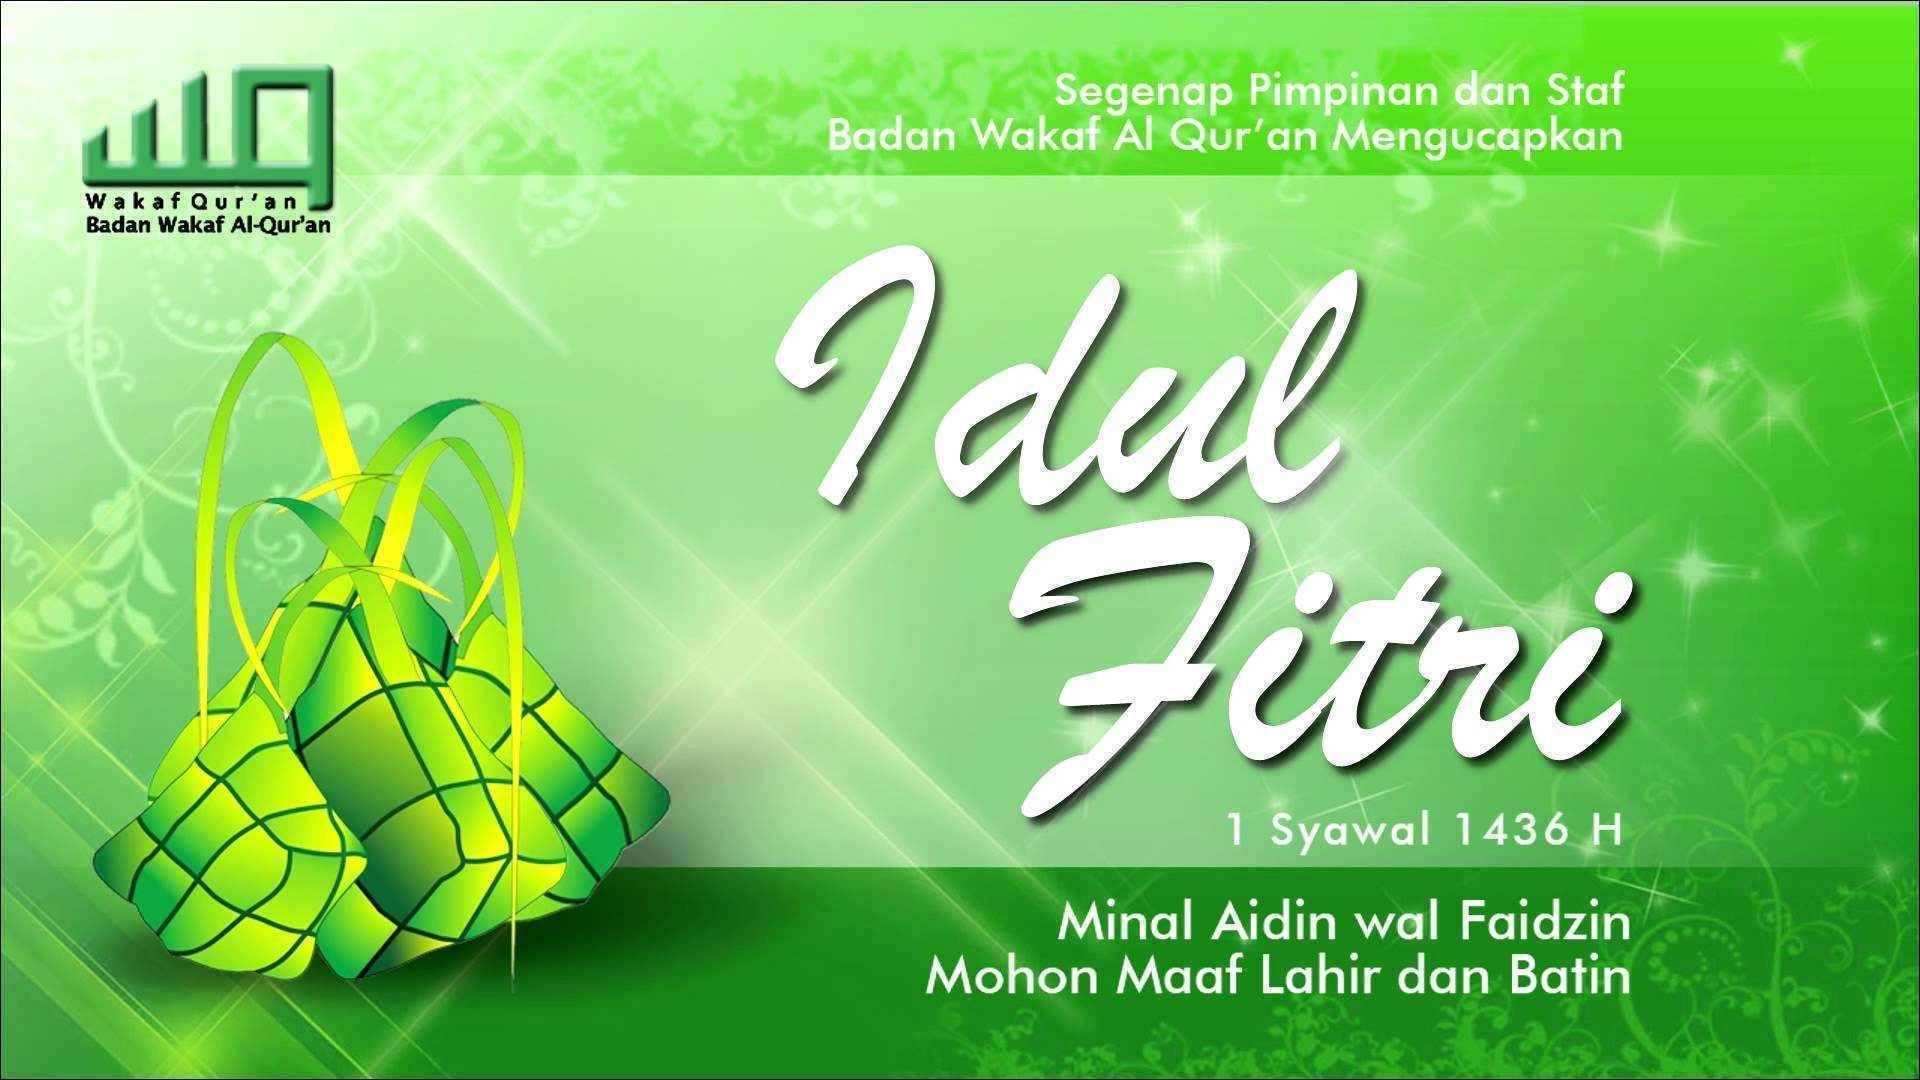 Gambar Idul Fitri 1438 H Terbaru Wallpaper Idul Fitri - Ketupat Idul Fitri , HD Wallpaper & Backgrounds